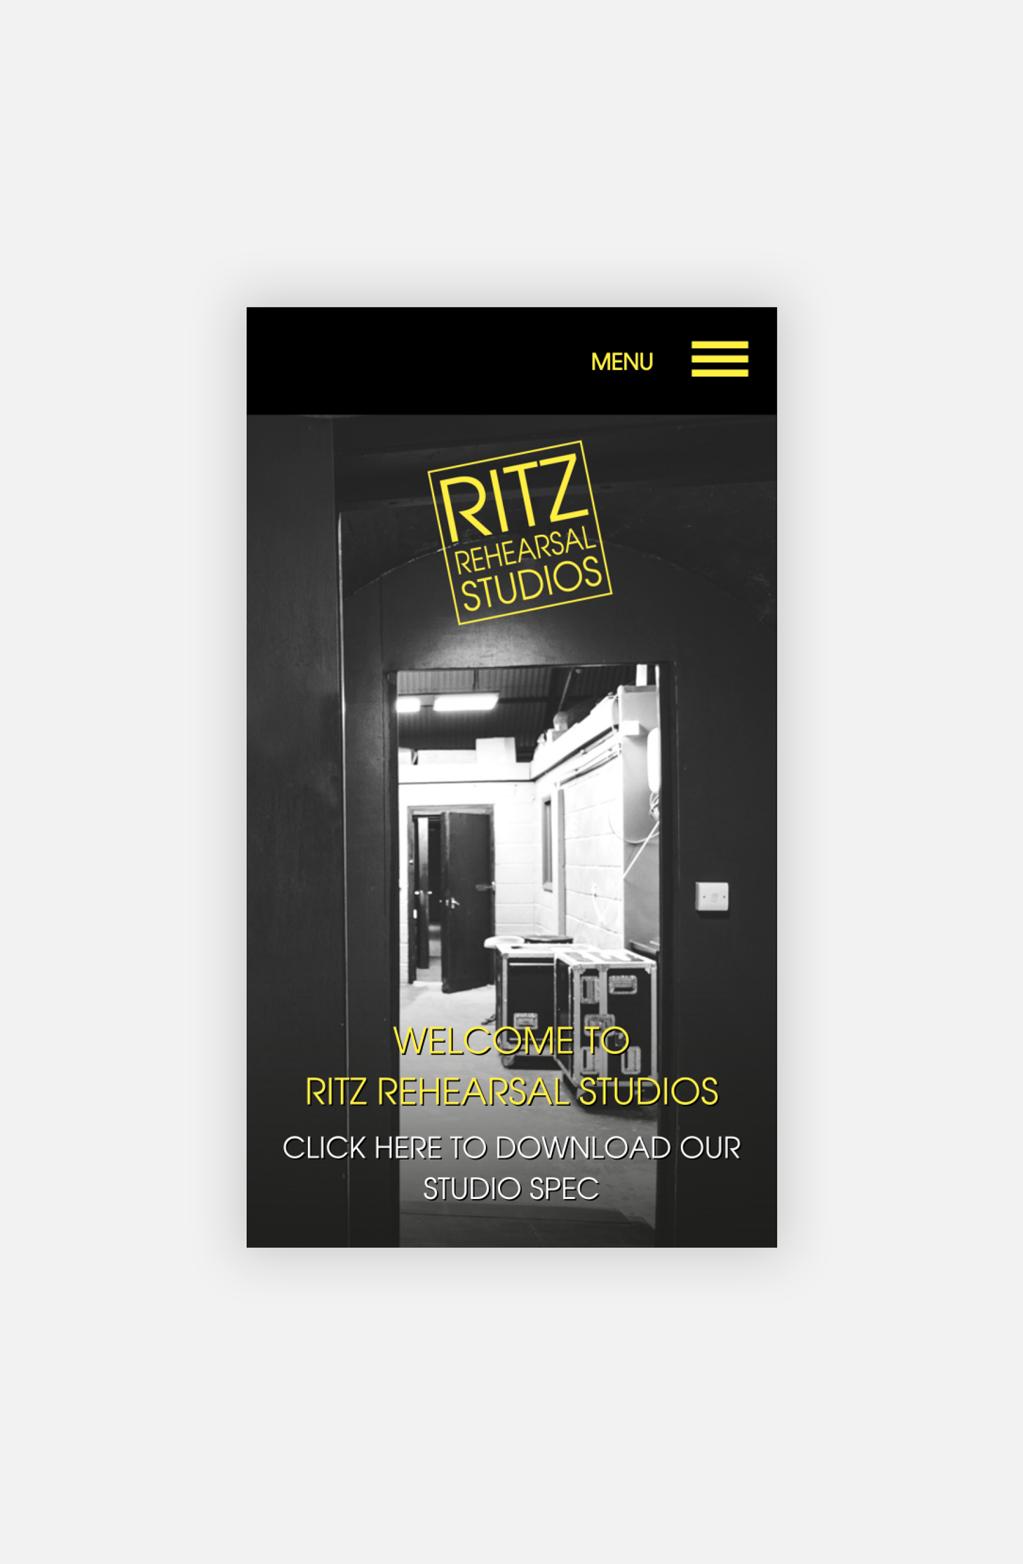 Ritz Rehearsal Studios Mobile